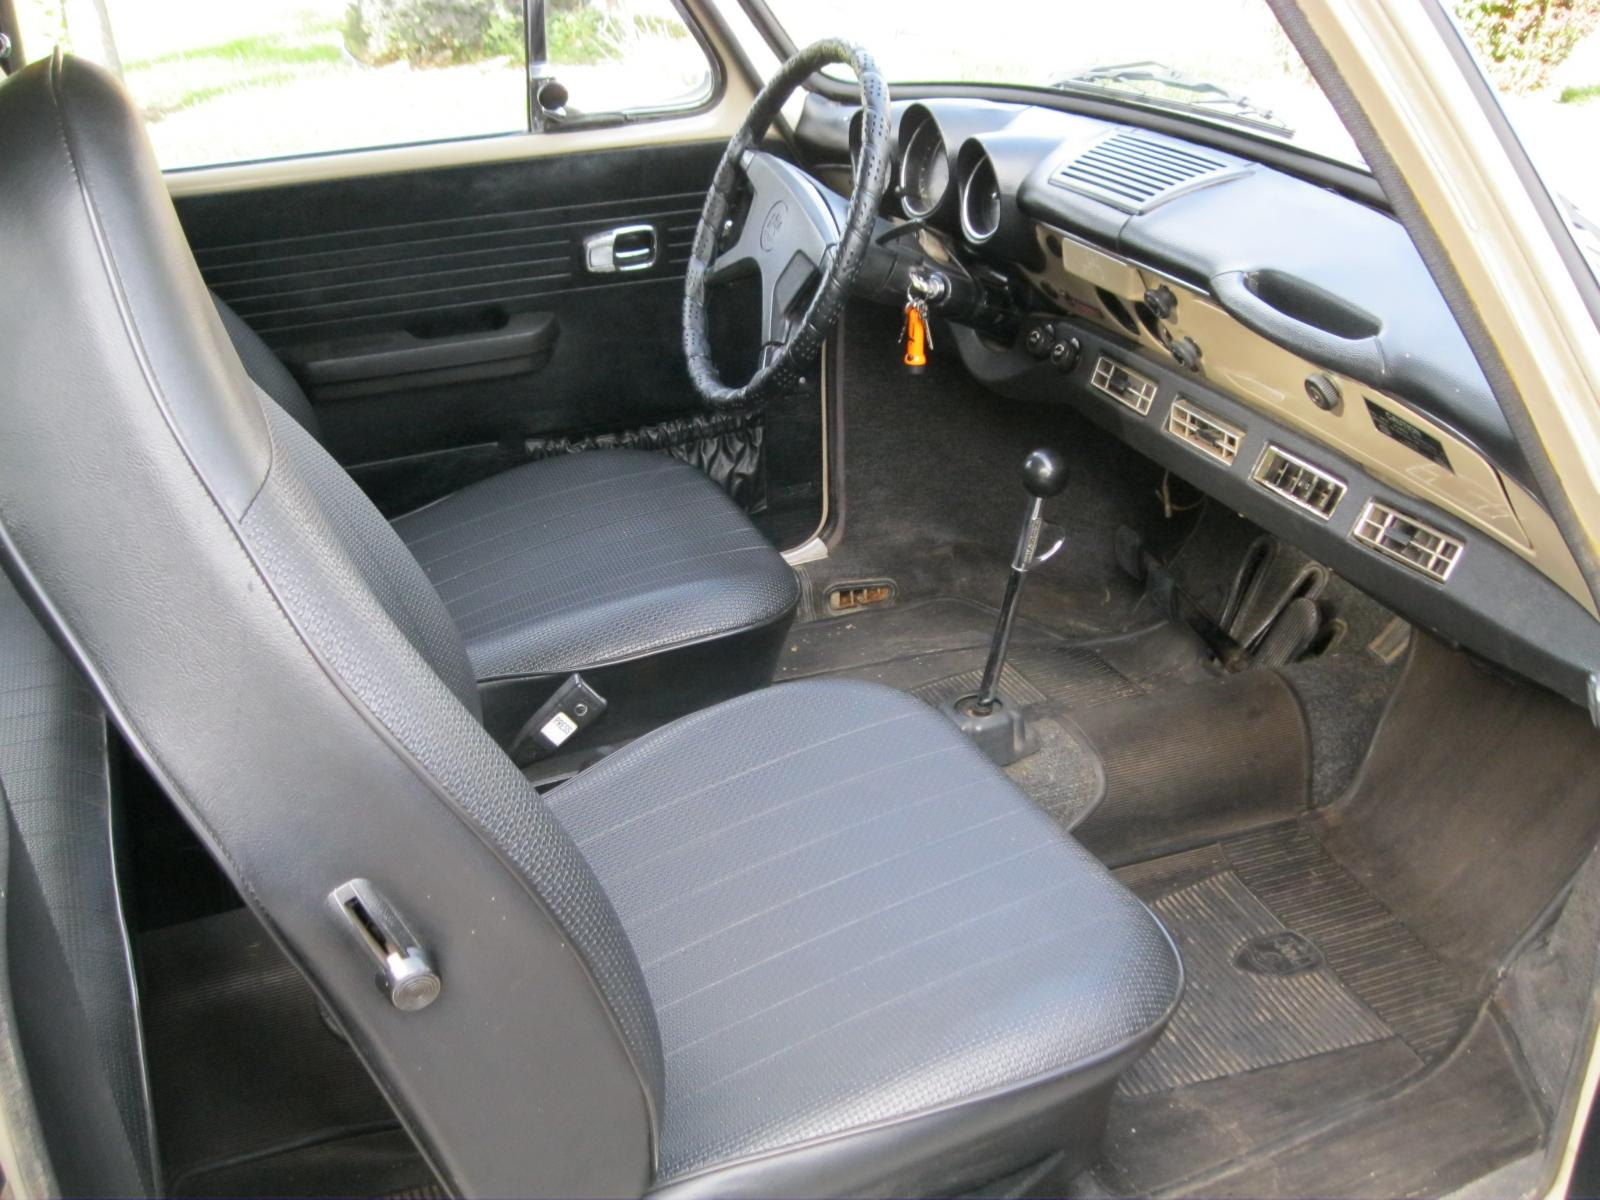 1973 Squareback